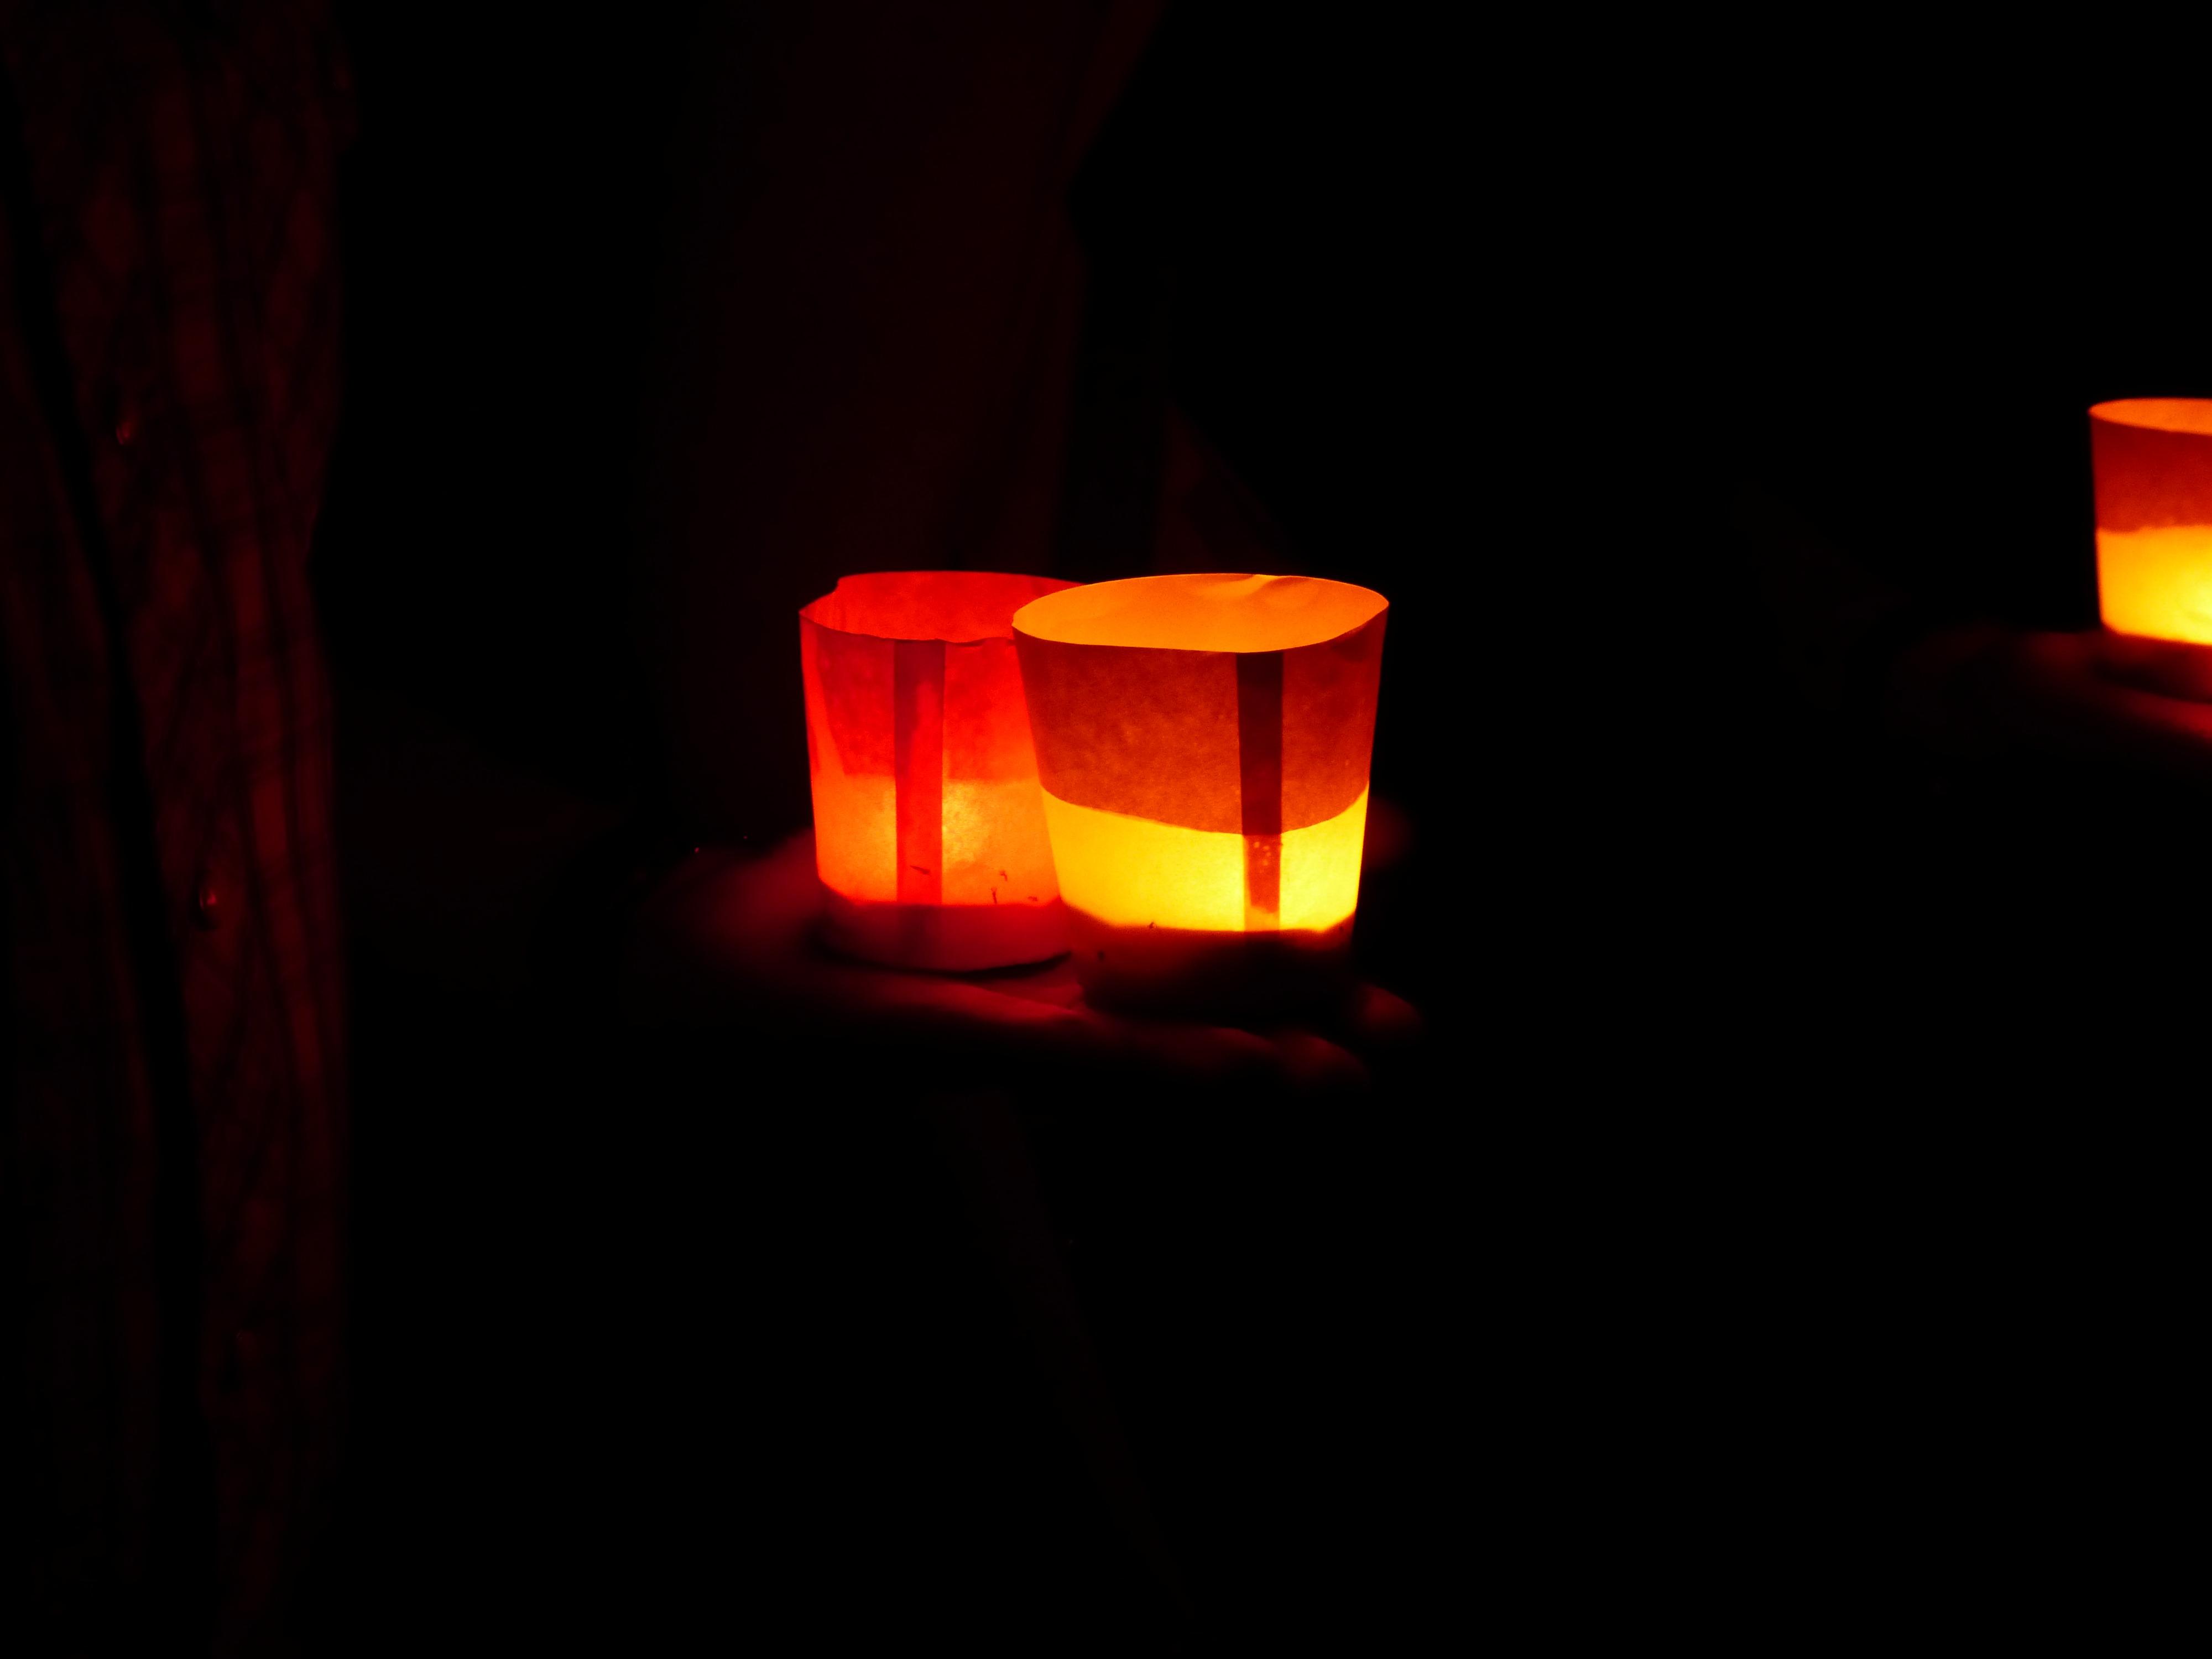 fotos gratis agua ligero noche atmsfera ro nadar amor naranja linterna rojo llama romance oscuridad amarillo iluminacin calor